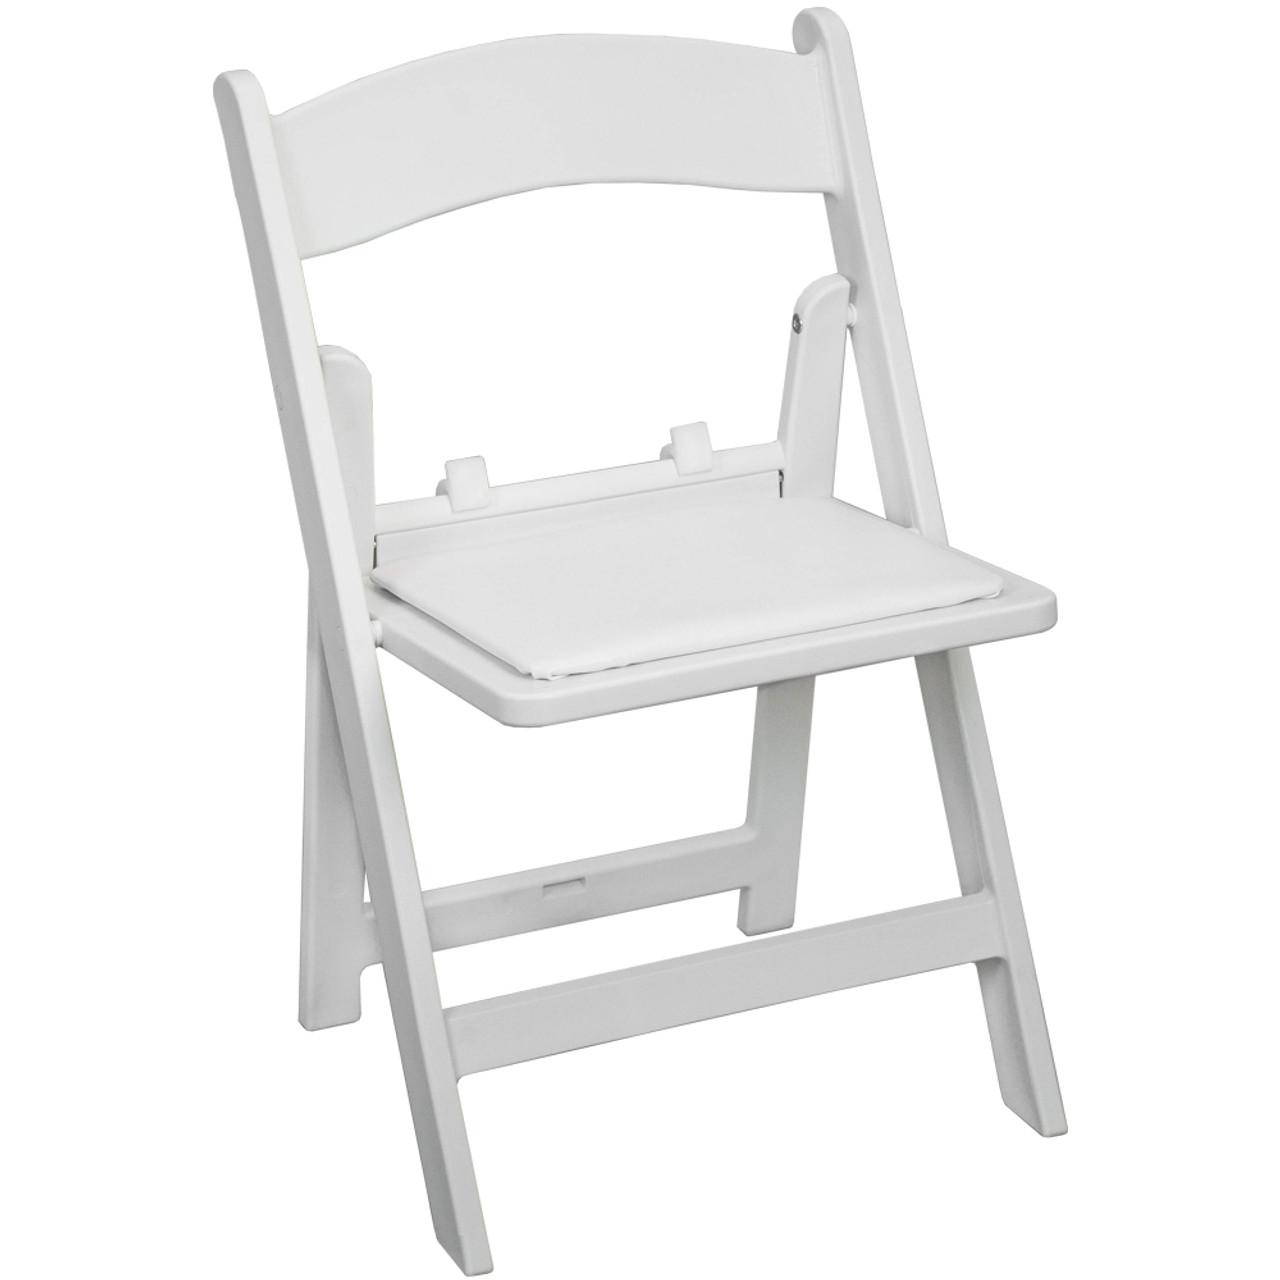 Pleasing Advantage Kids White Resin Folding Chair Rfwca Kid 100 Interior Design Ideas Gentotryabchikinfo